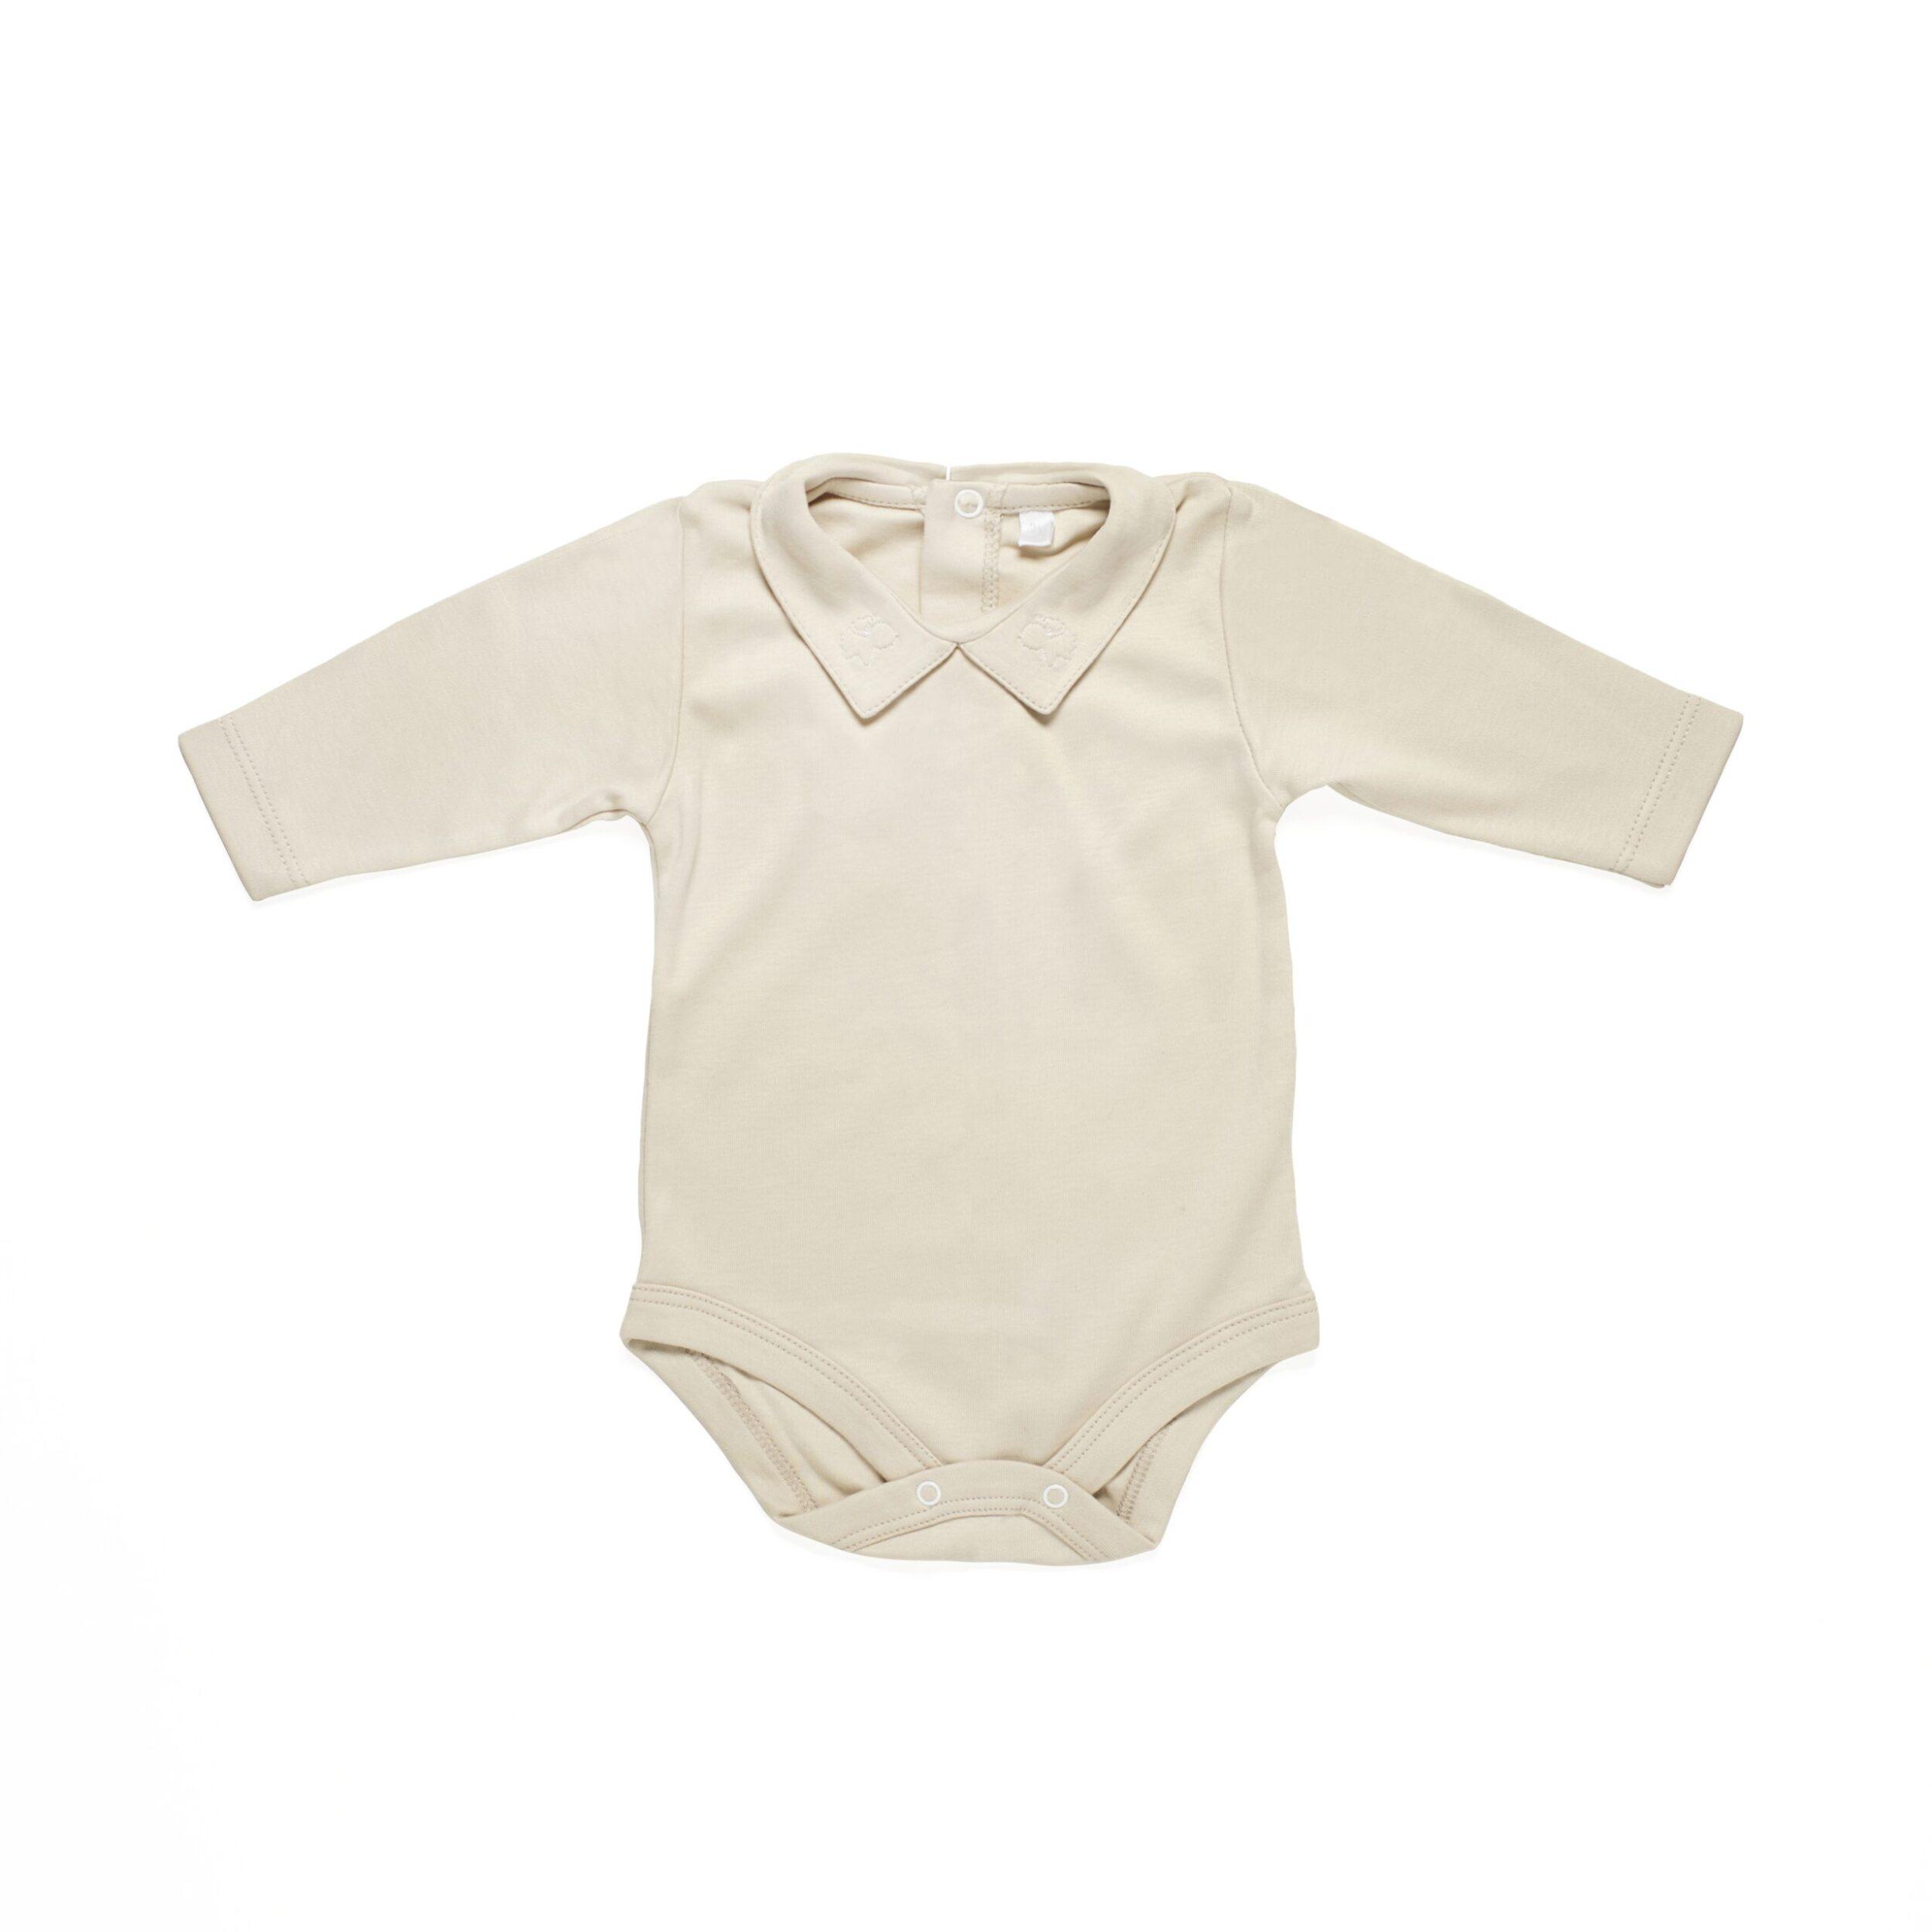 Long sleeve body baby newborn organic pima cotton slowfashion quality sand